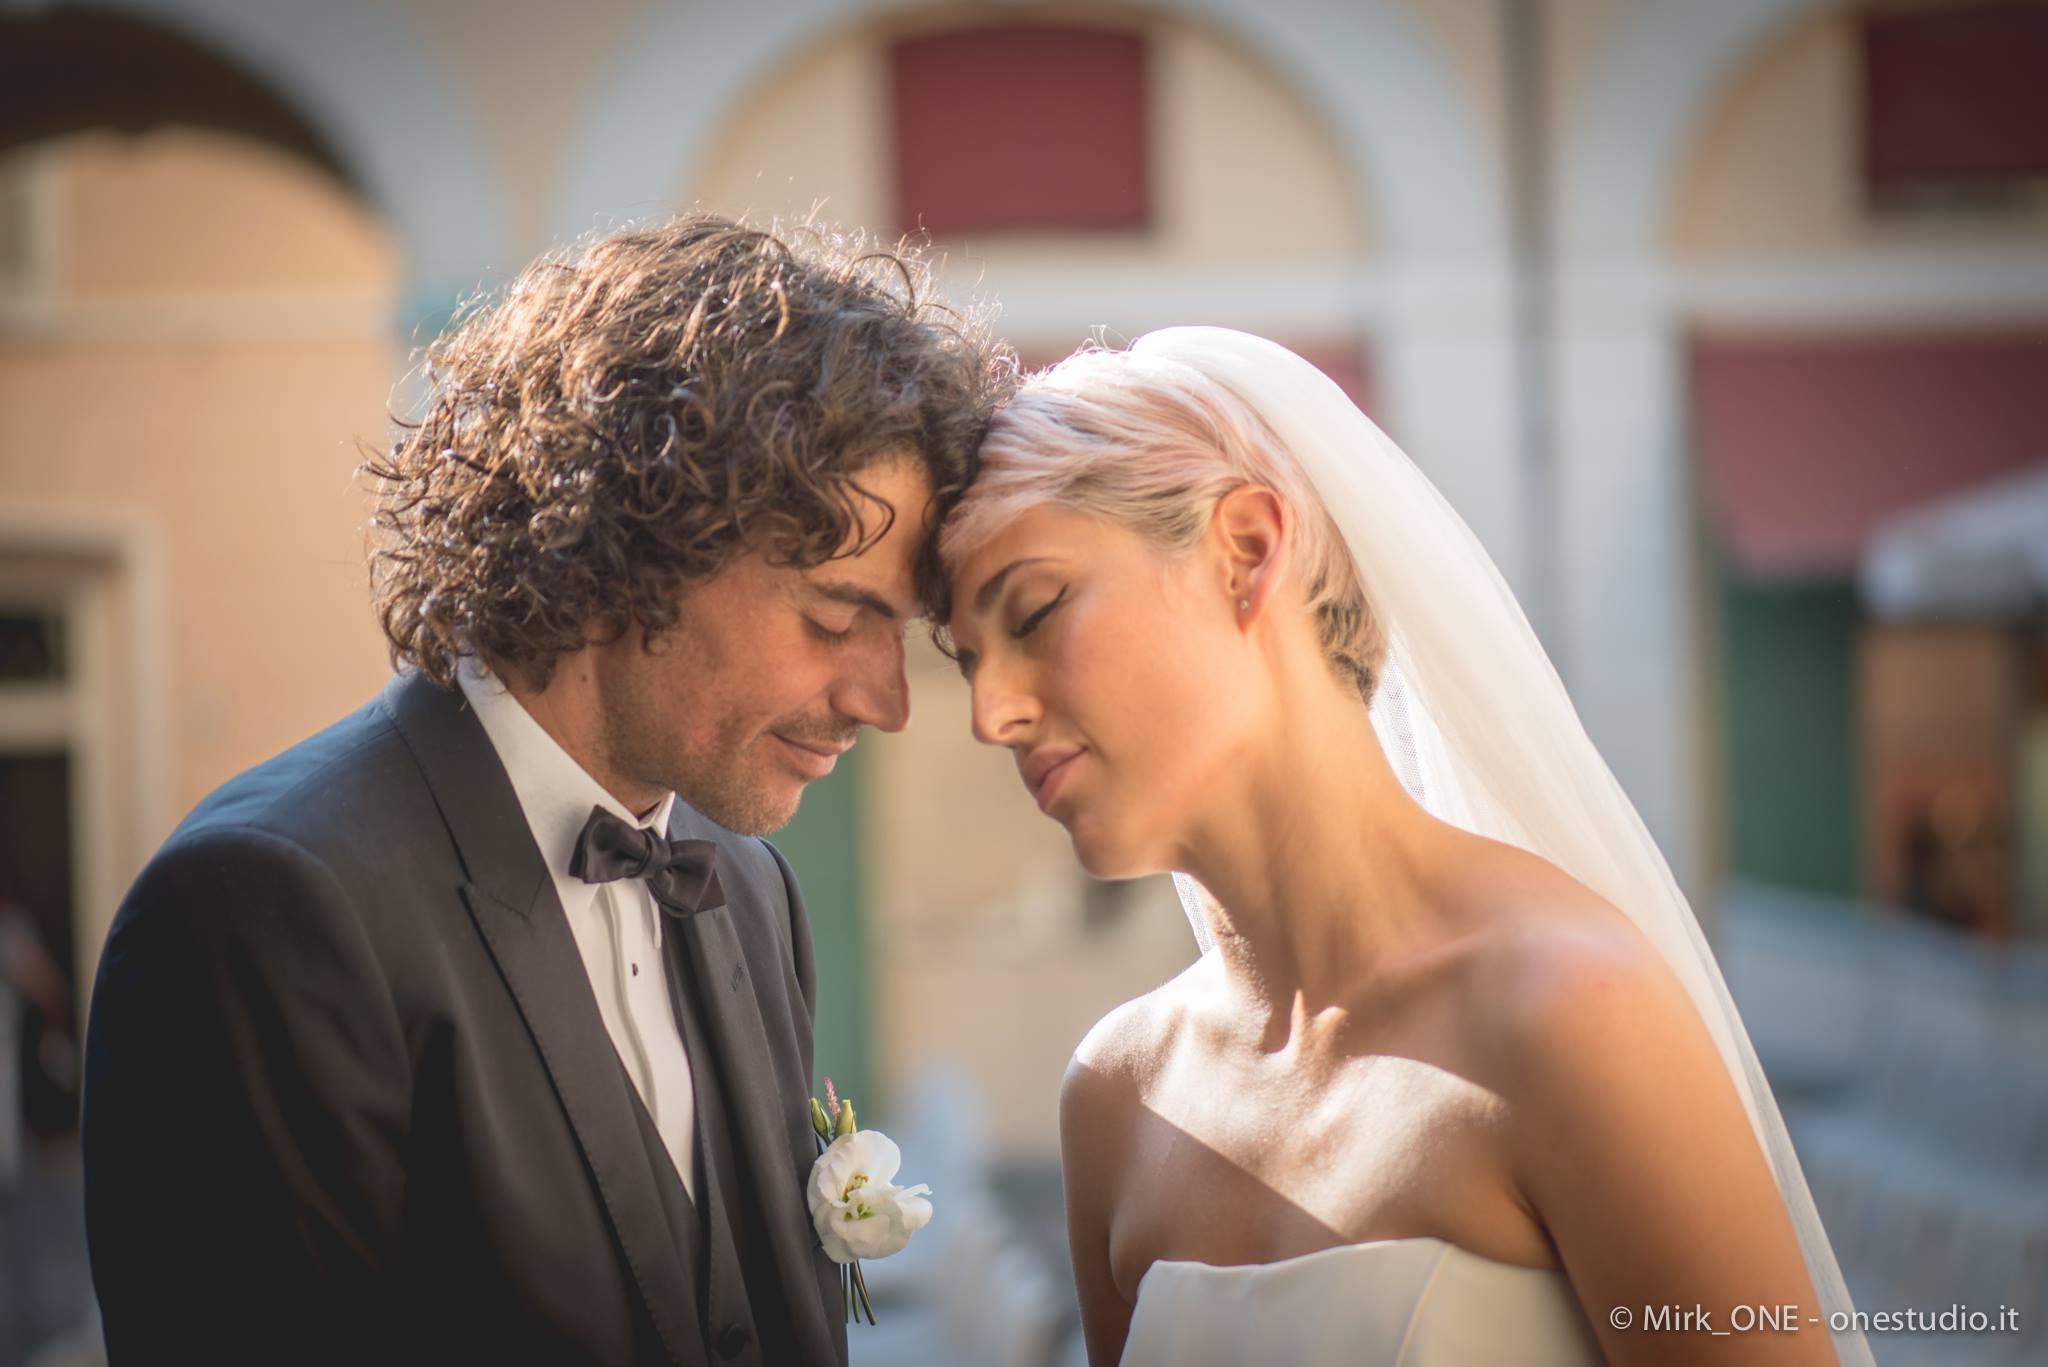 https://lnx.mirkone.it/wp-content/uploads/2015/07/mirk_ONE-fotografo-matrimonio-00827.jpg